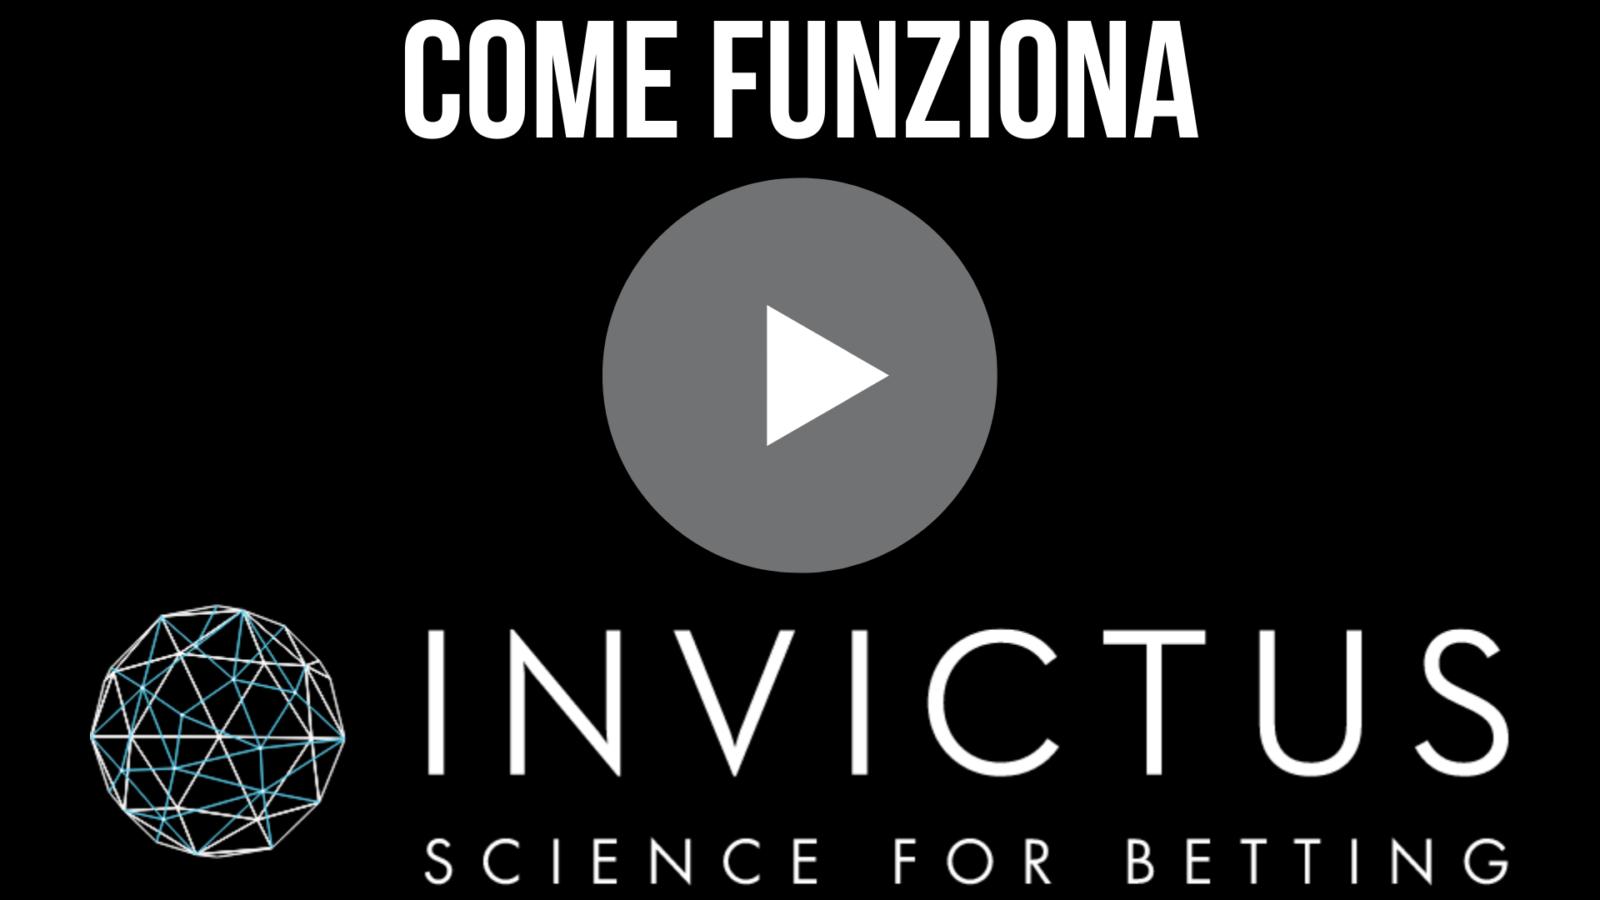 Video Invictus